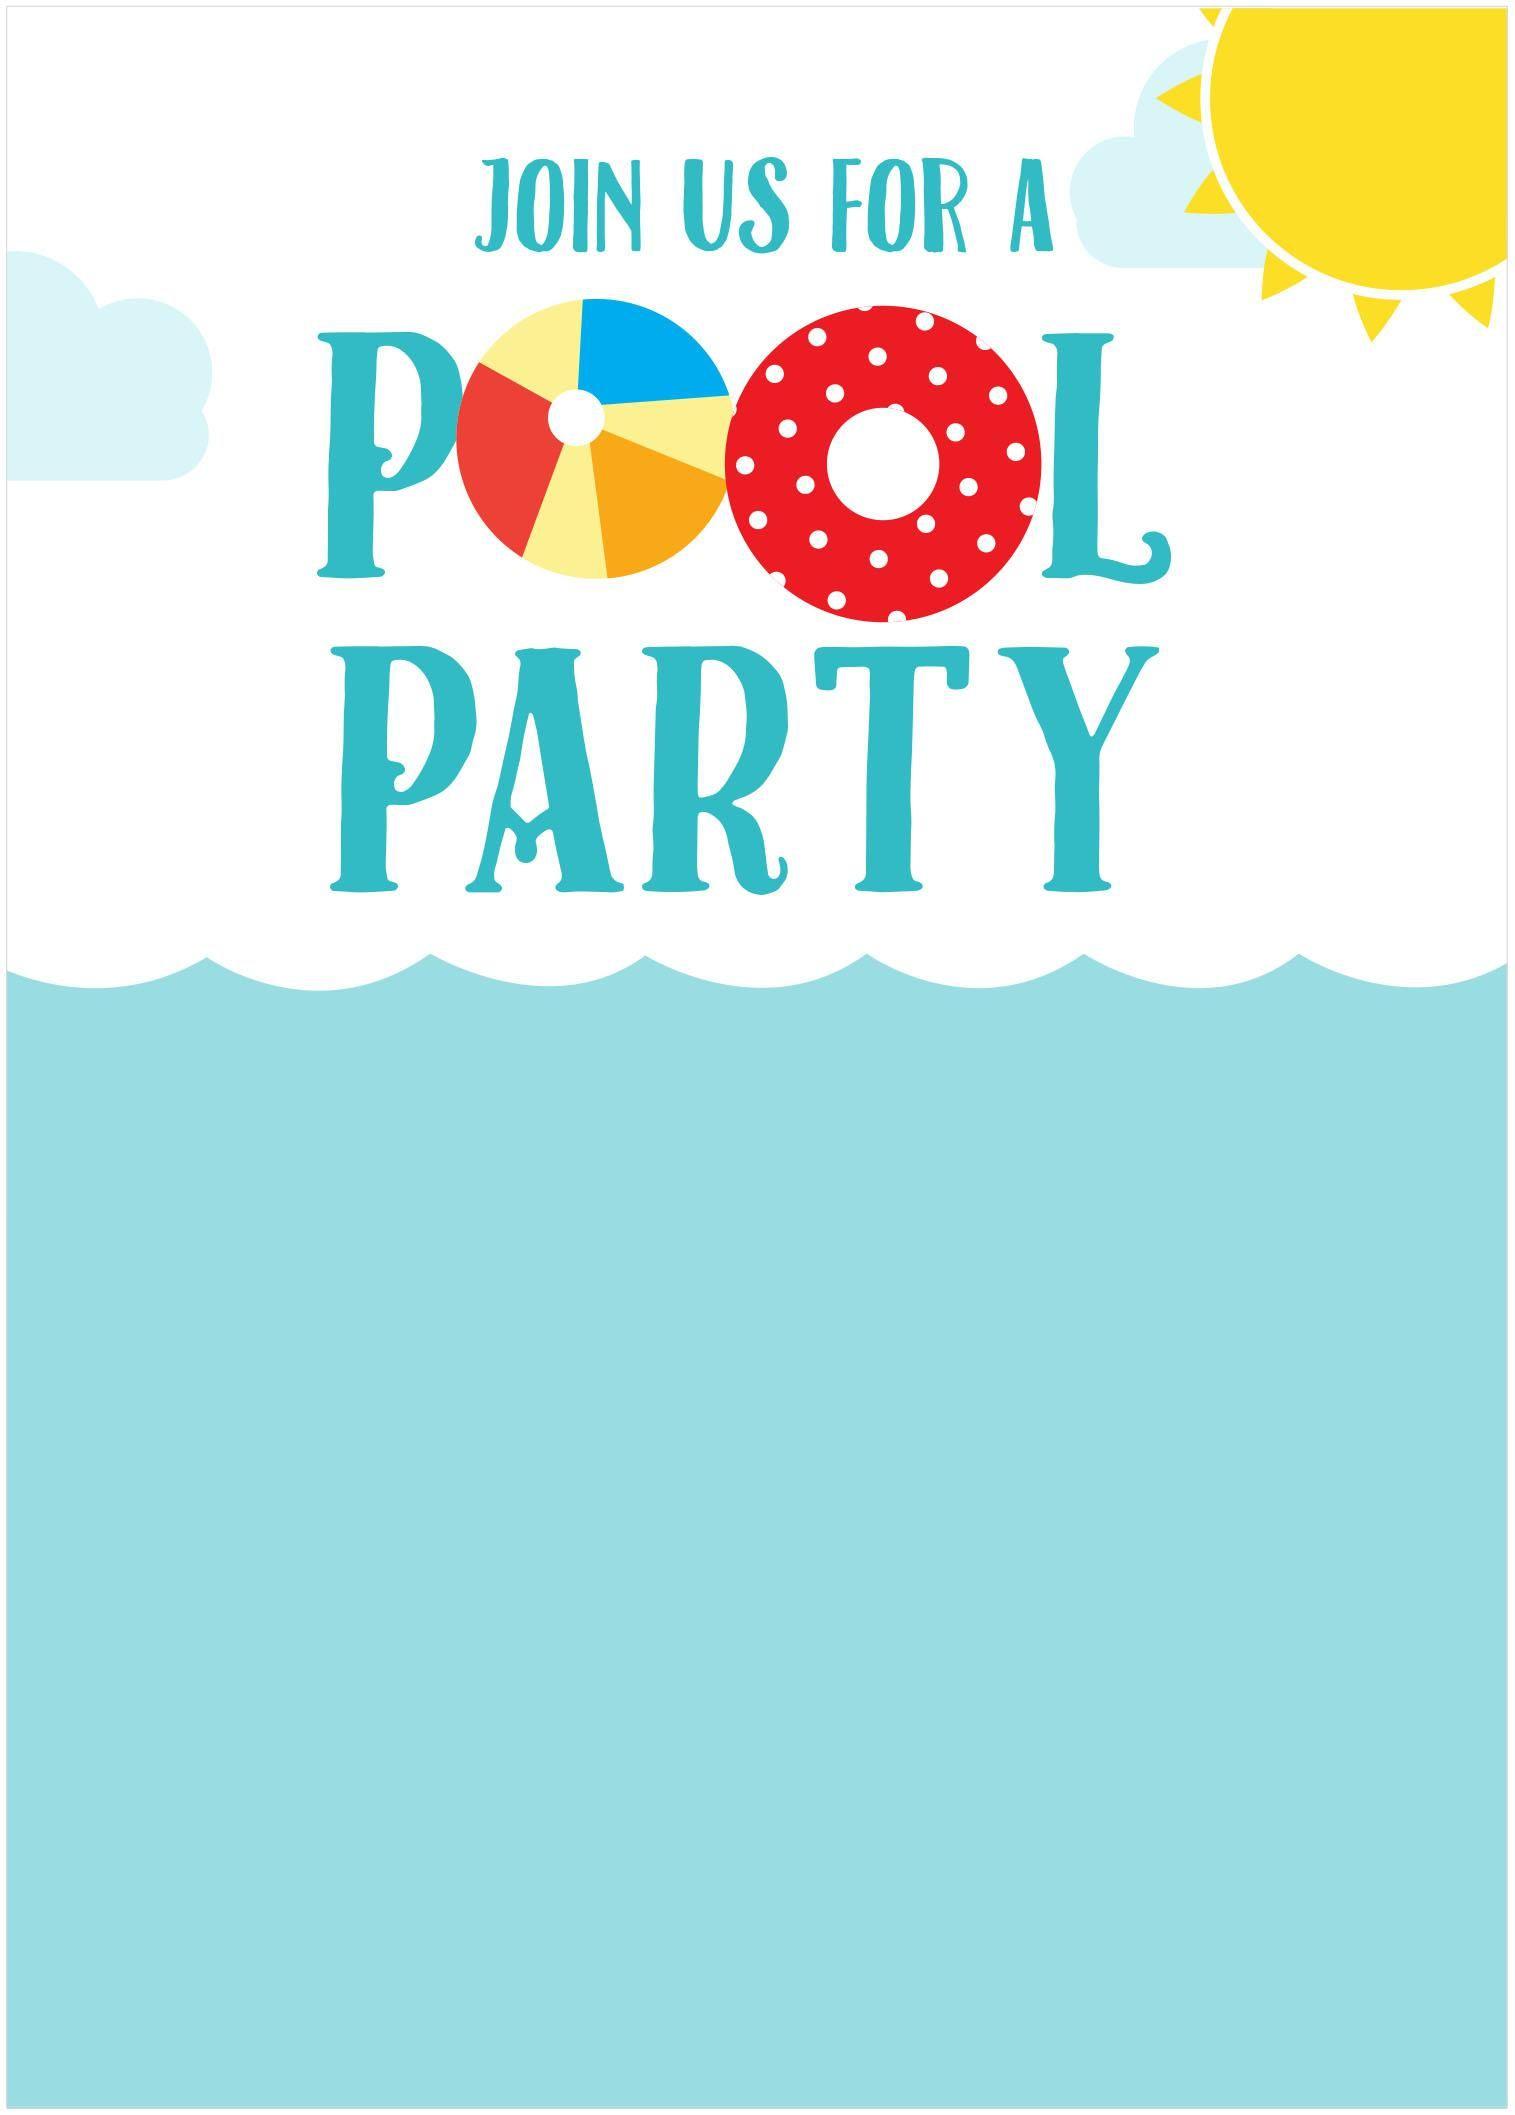 Party Invitation Template Party Invitation Templates Free Uk inside dimensions 1515 X 2115